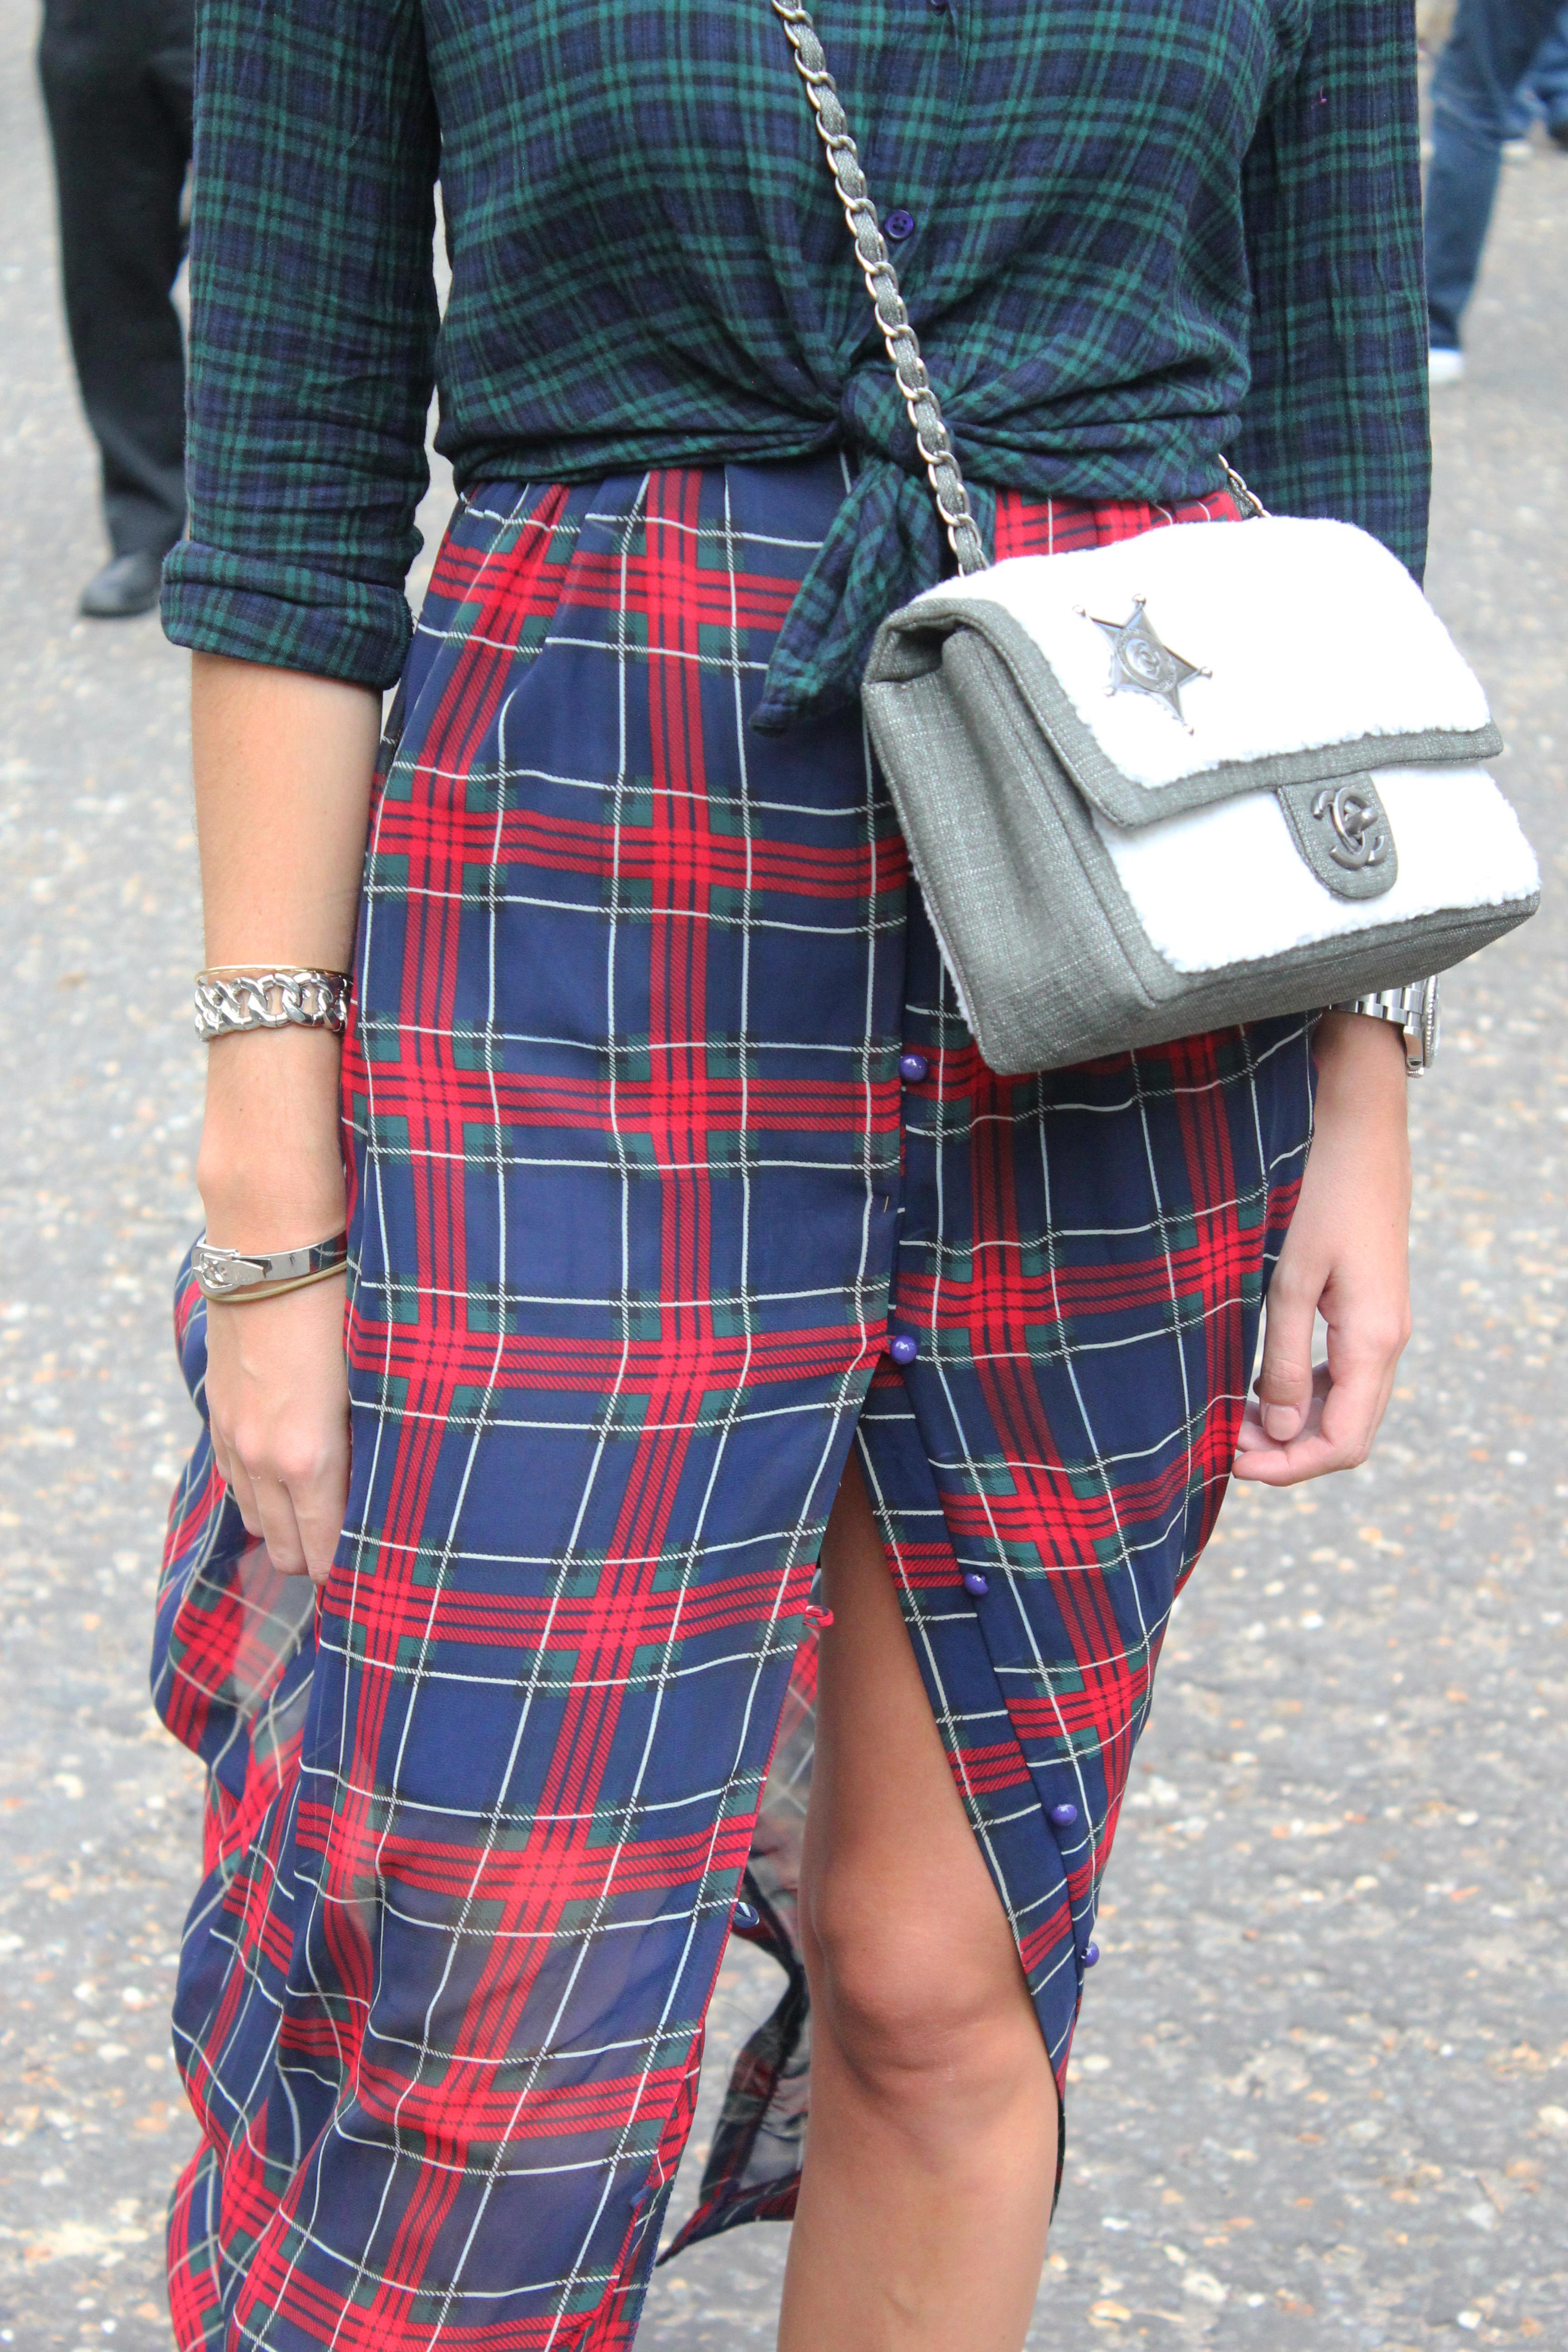 Chanel bag via Farfetch